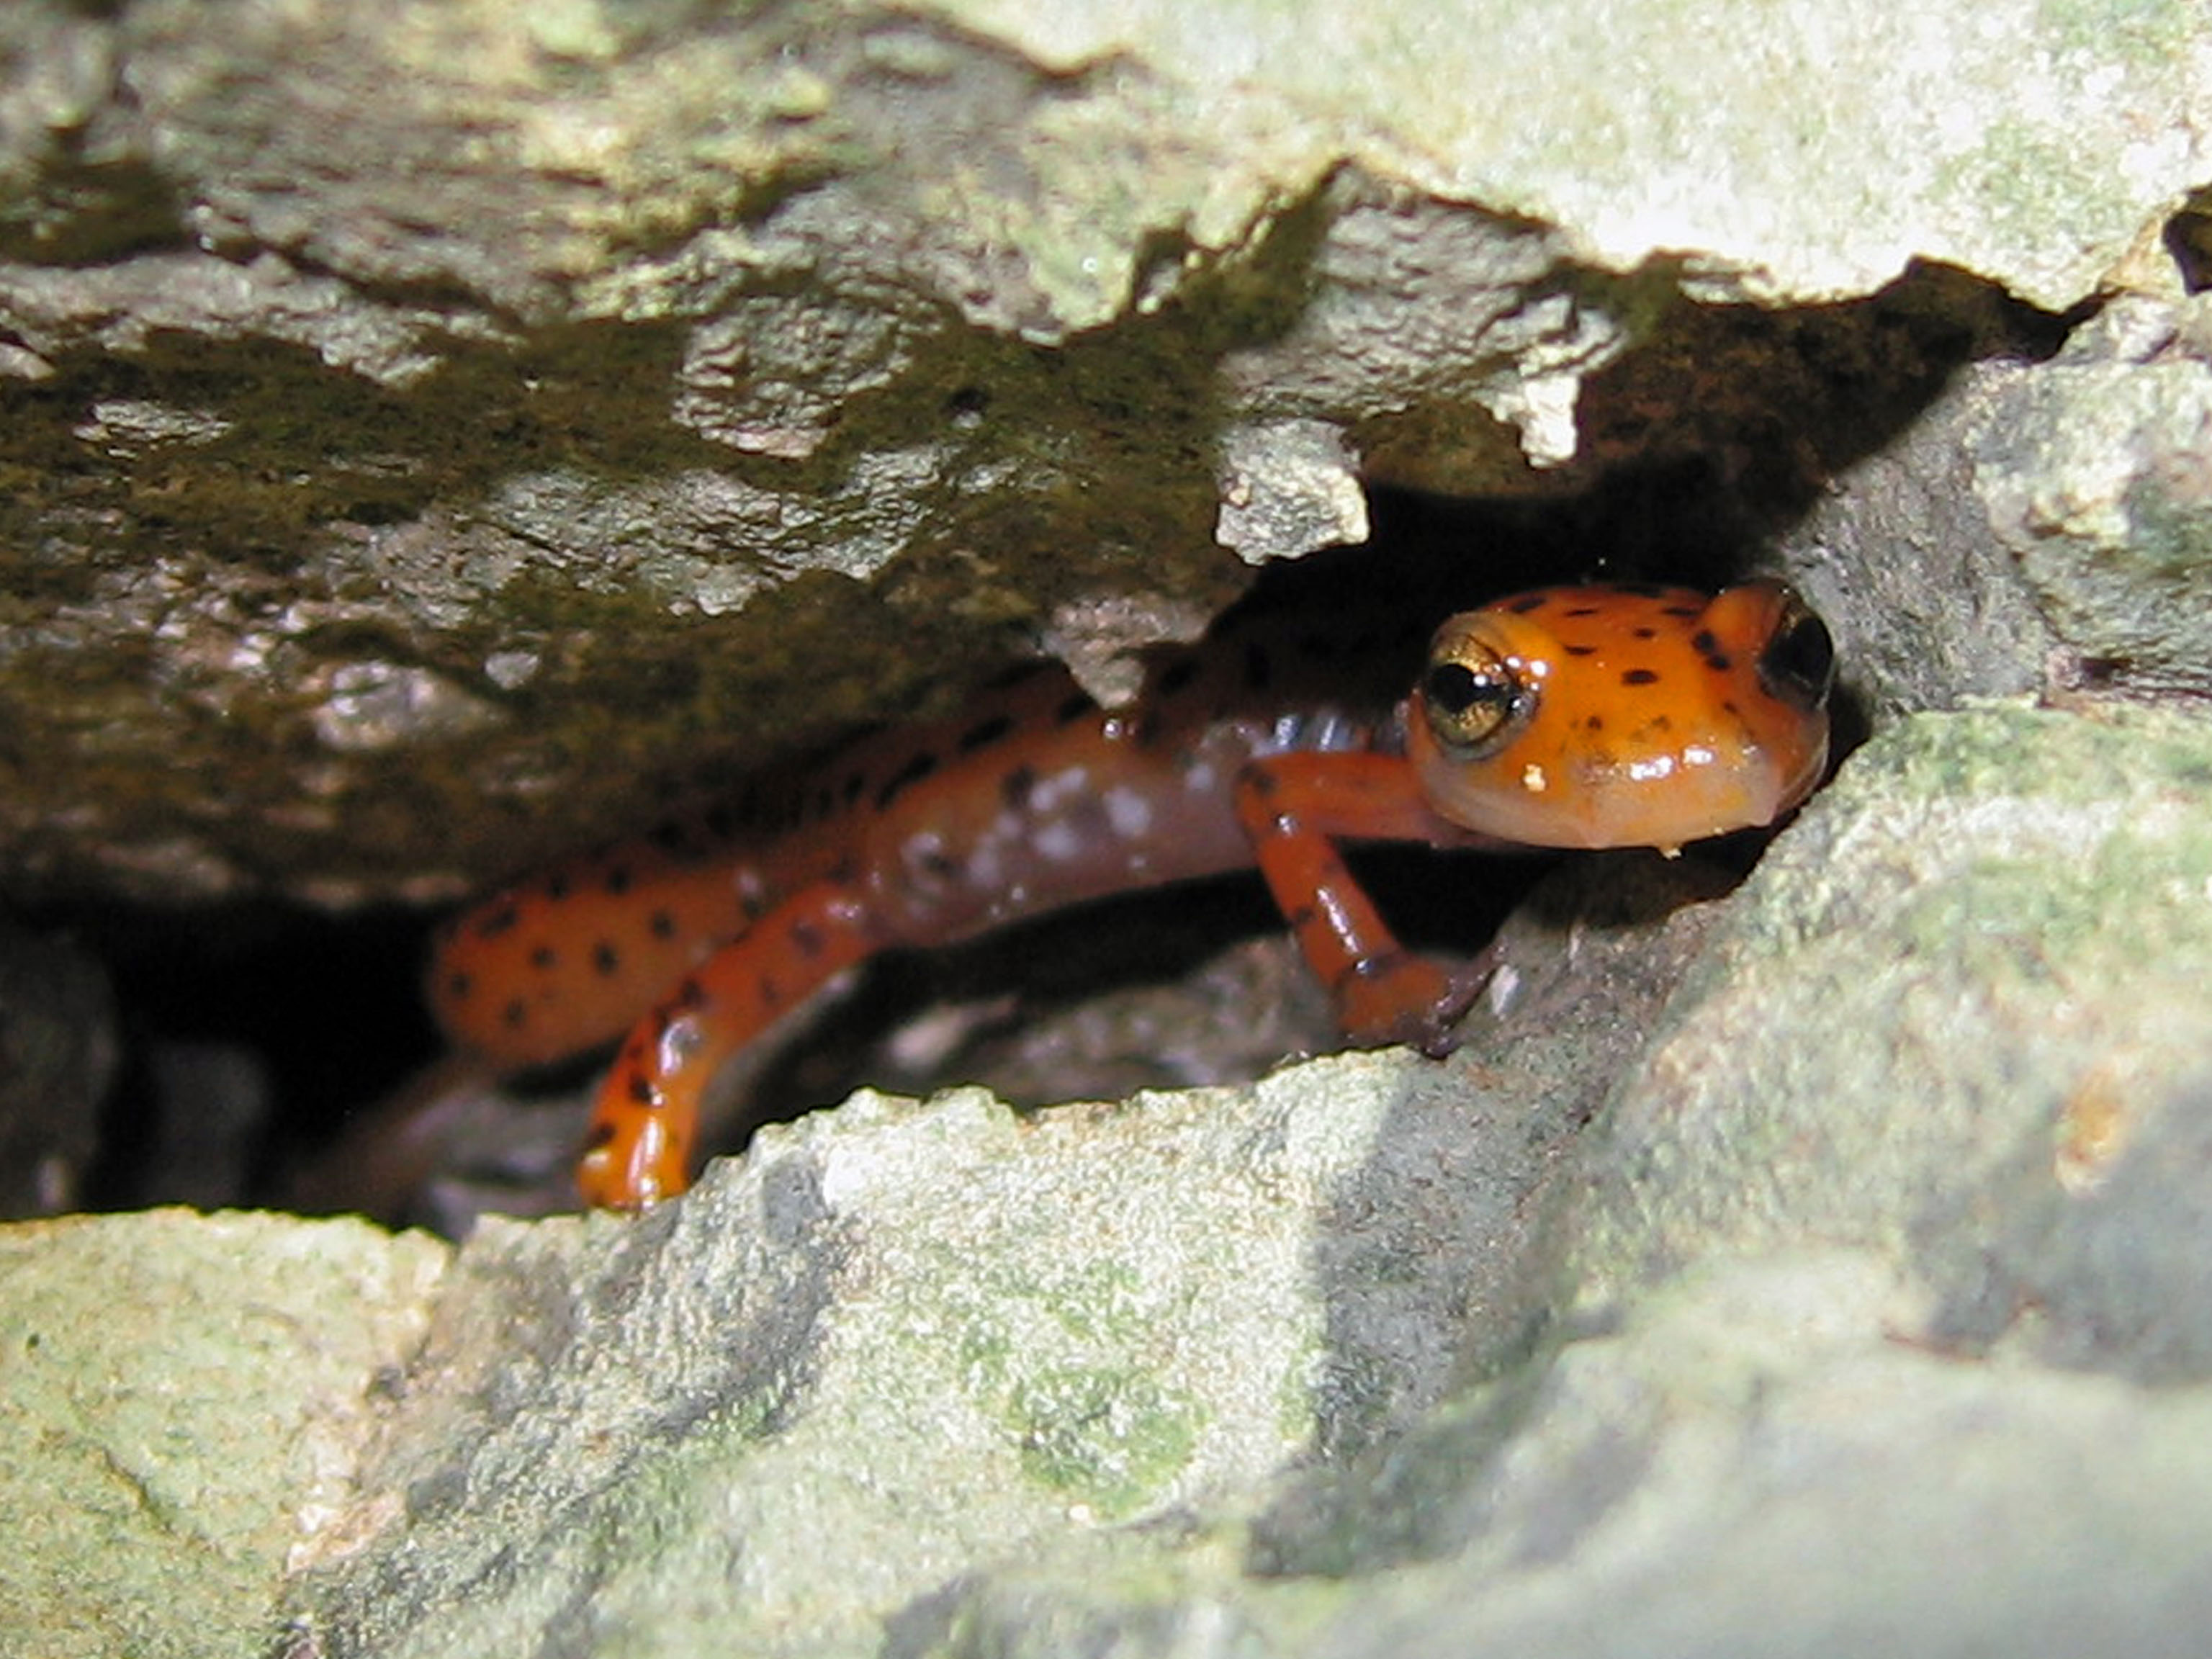 Cave_Salamander_Eurycea_lucifuga